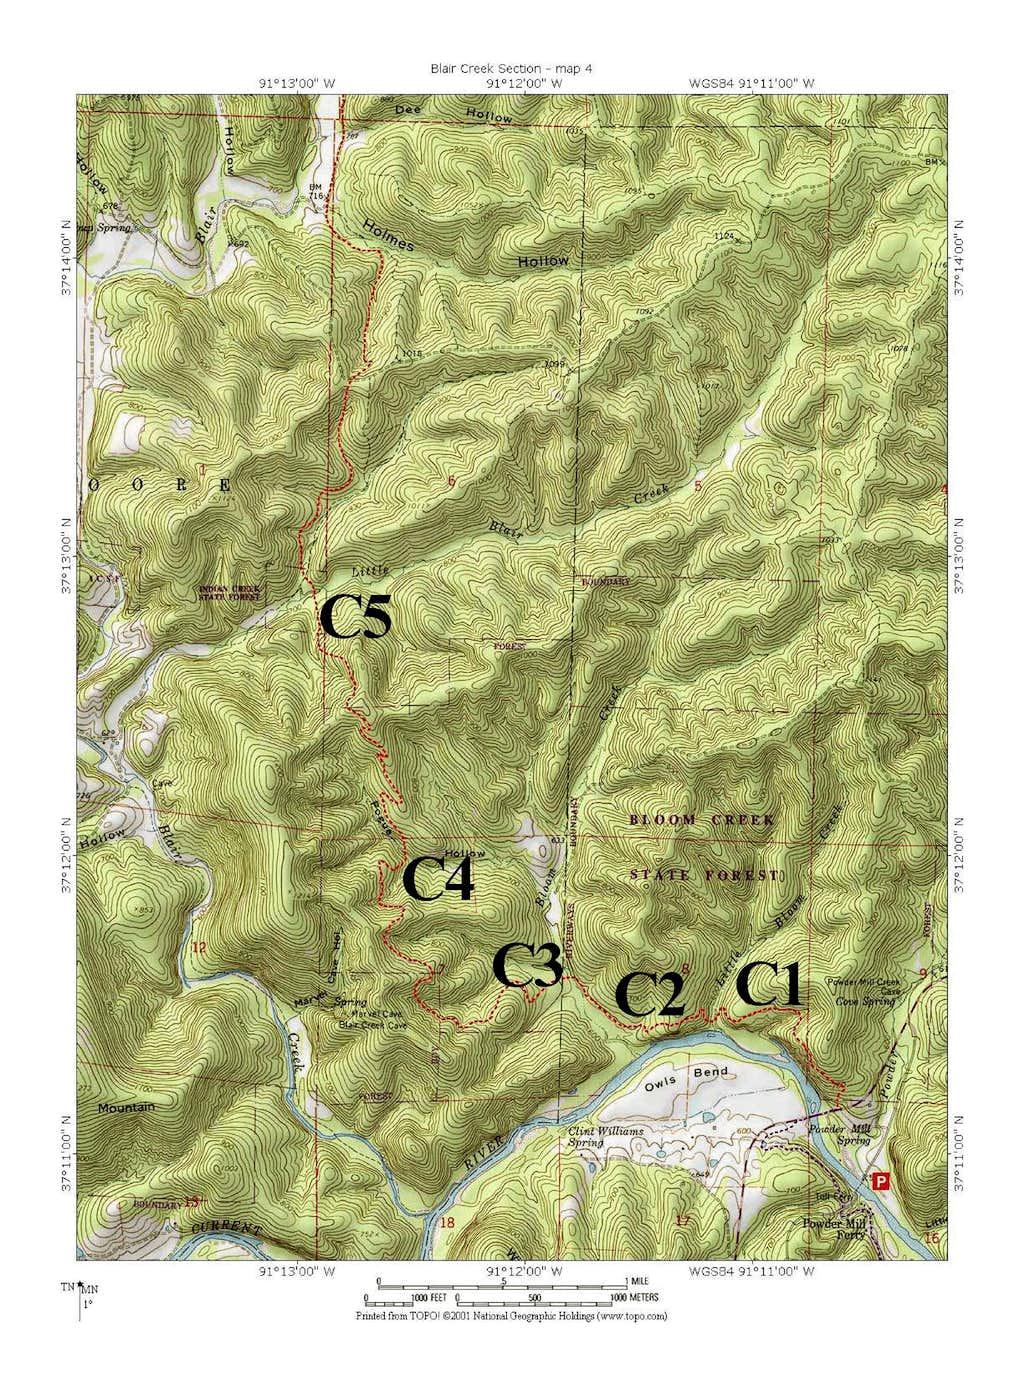 Campsites, Blair Creek Section #4, Ozark Trail